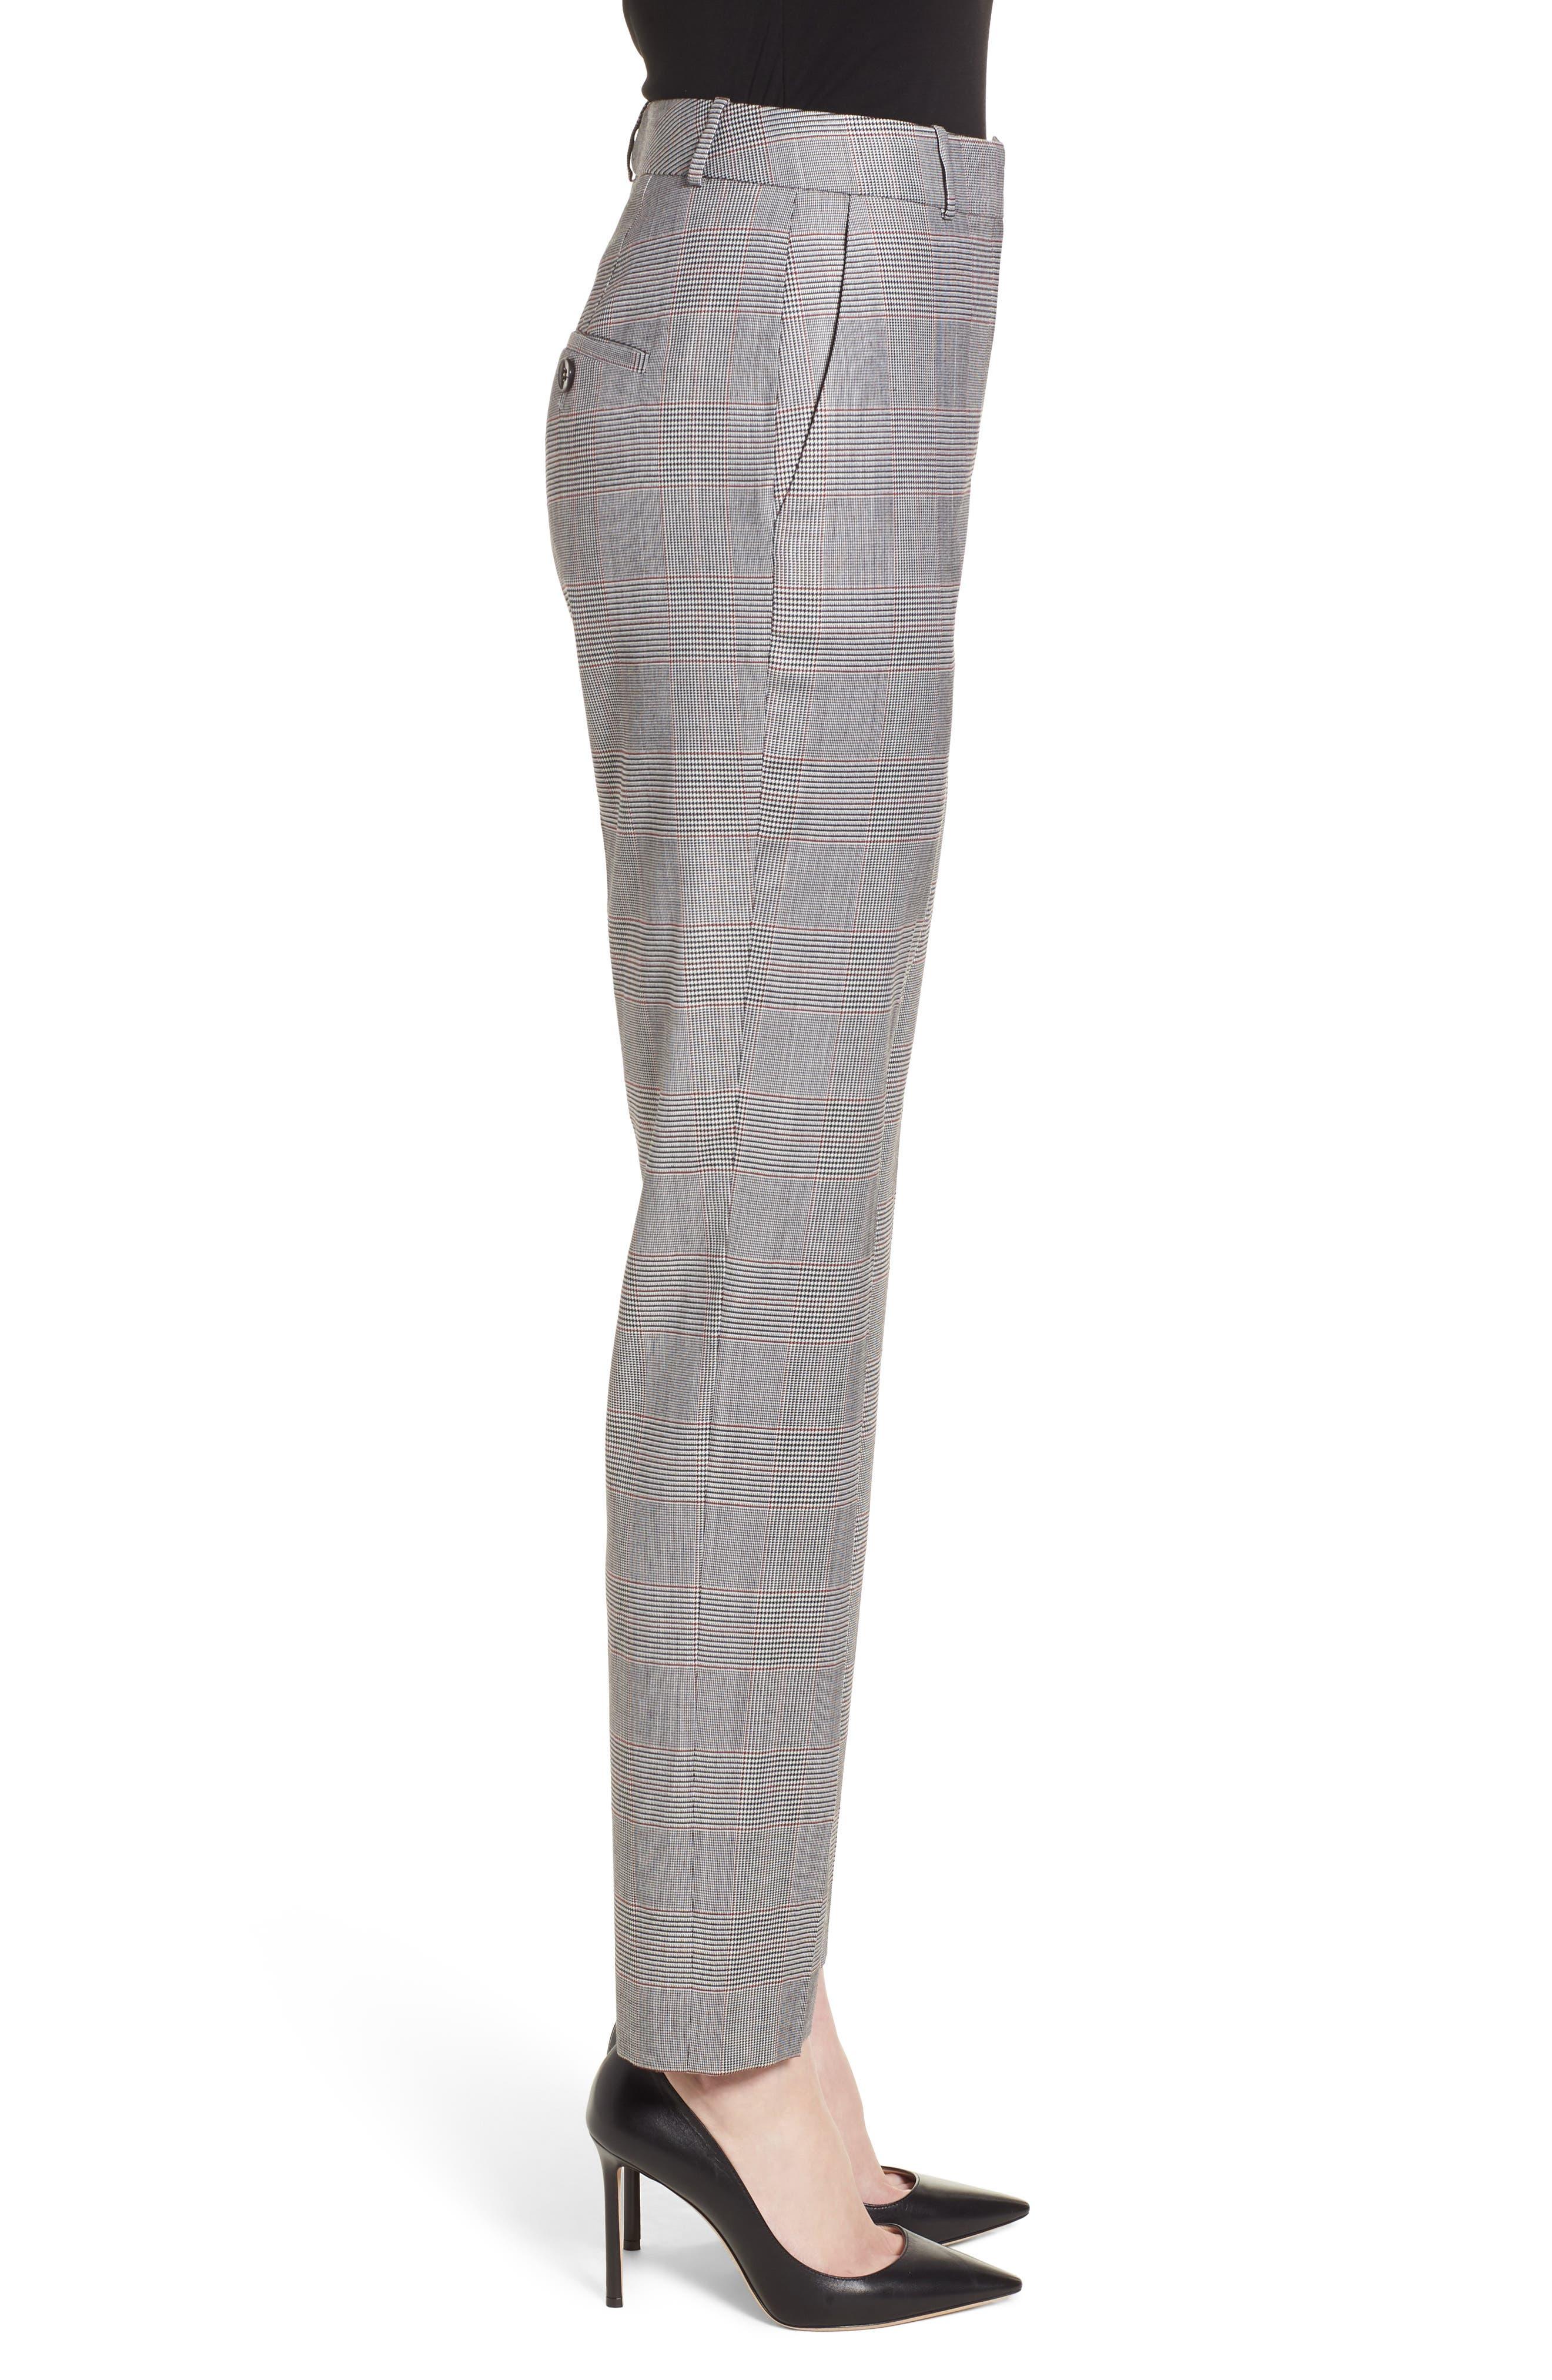 Tofilia Glencheck Slim Fit Trousers,                             Alternate thumbnail 3, color,                             Dark Sunset Orange Fantasy